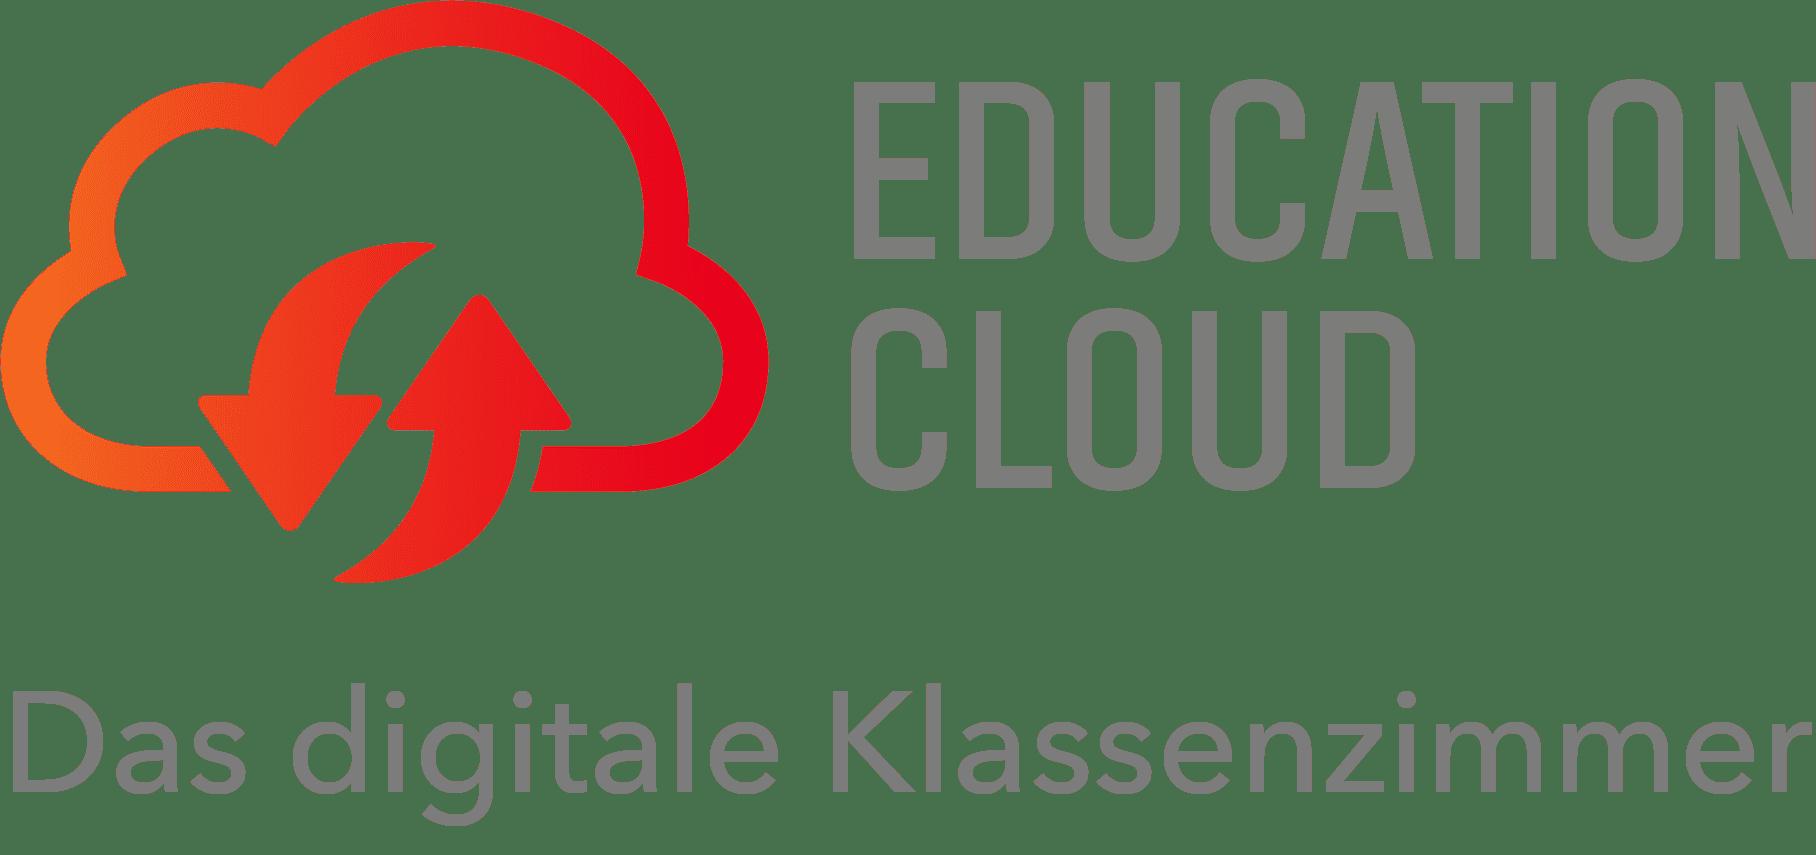 Logo-Education-Cloud